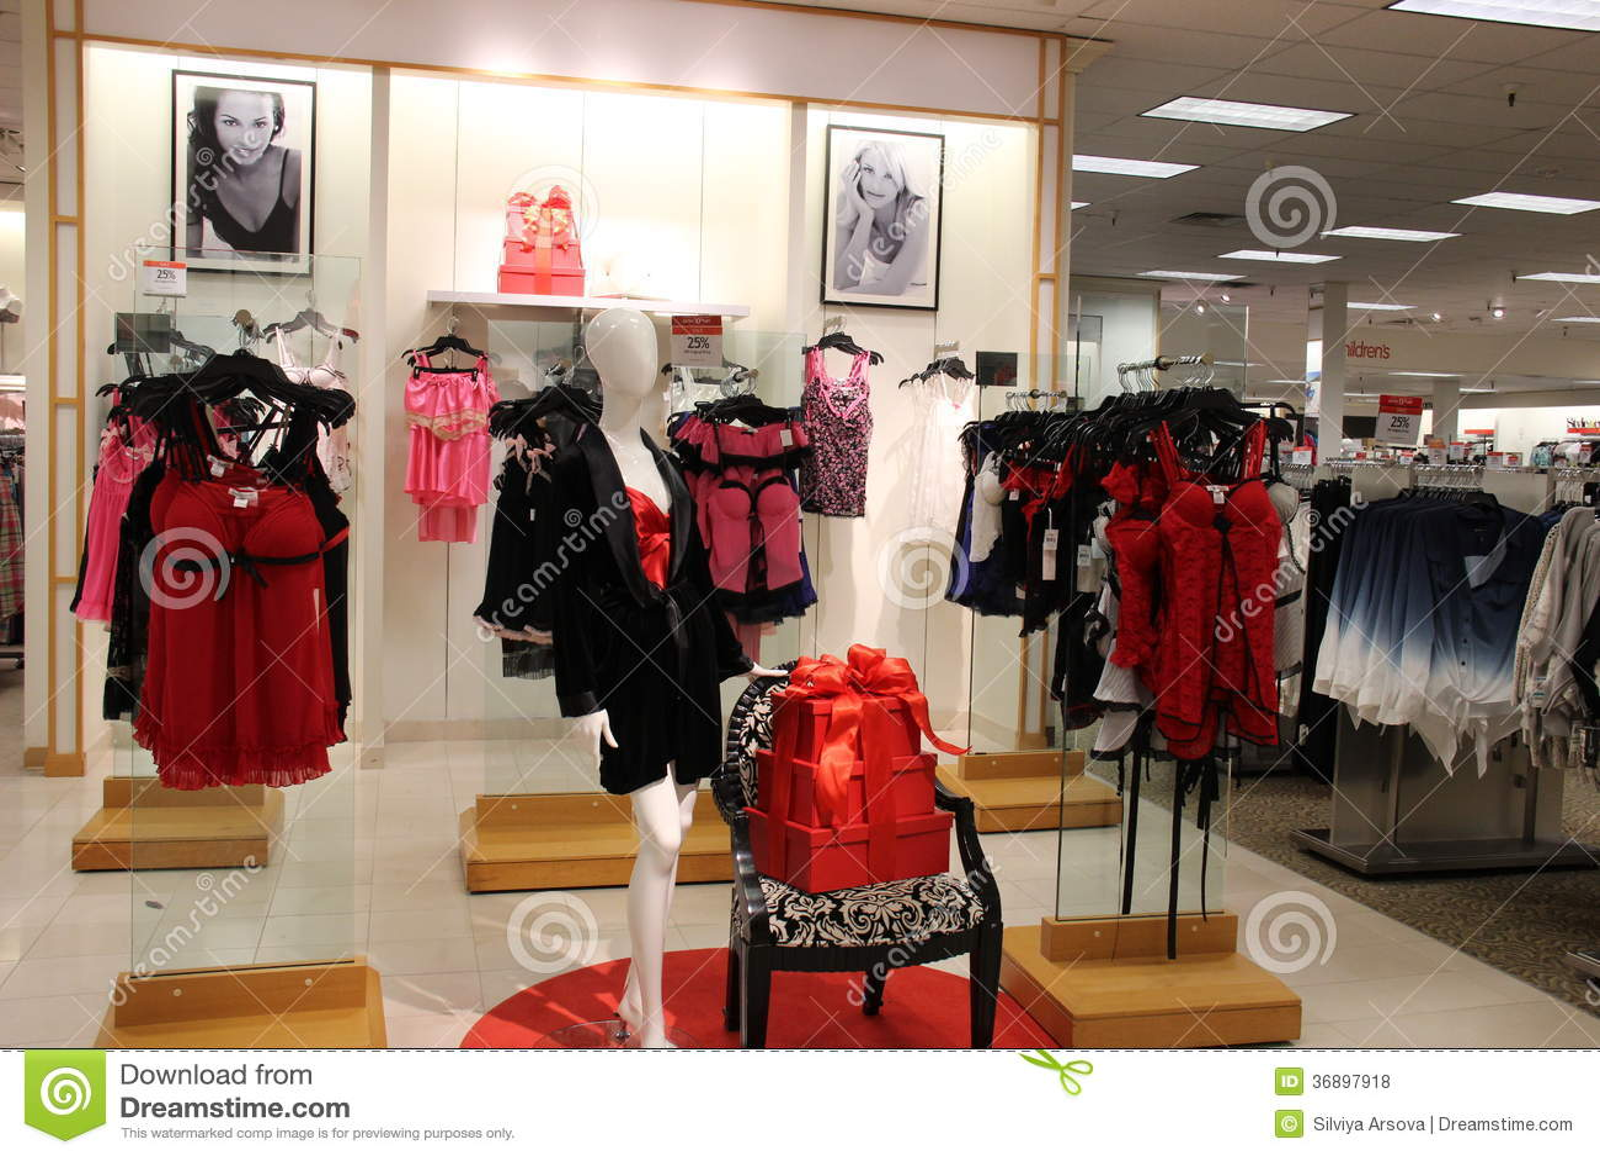 La moda clothing store